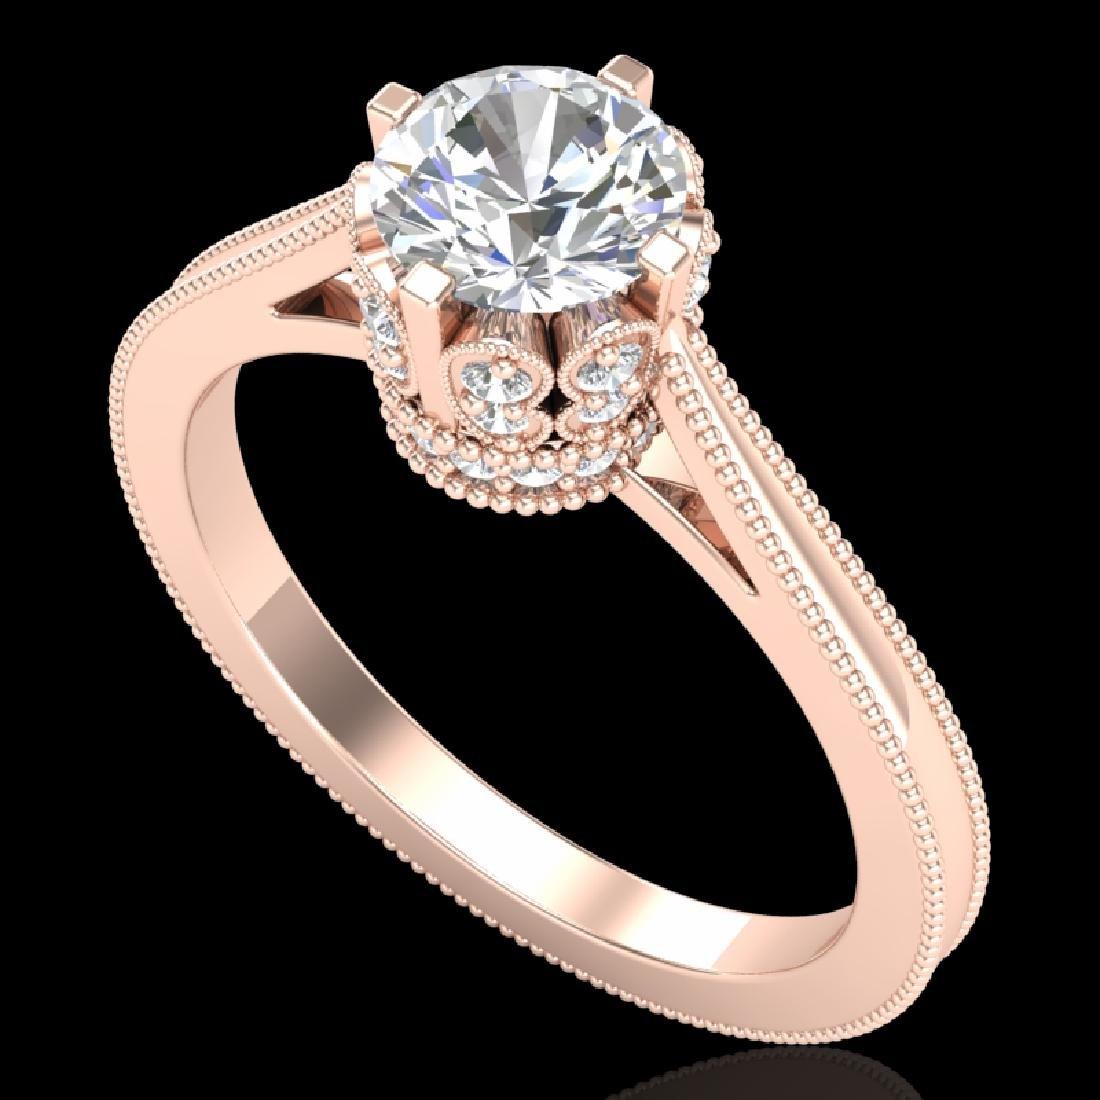 1.14 CTW VS/SI Diamond Solitaire Art Deco Ring 18K Rose